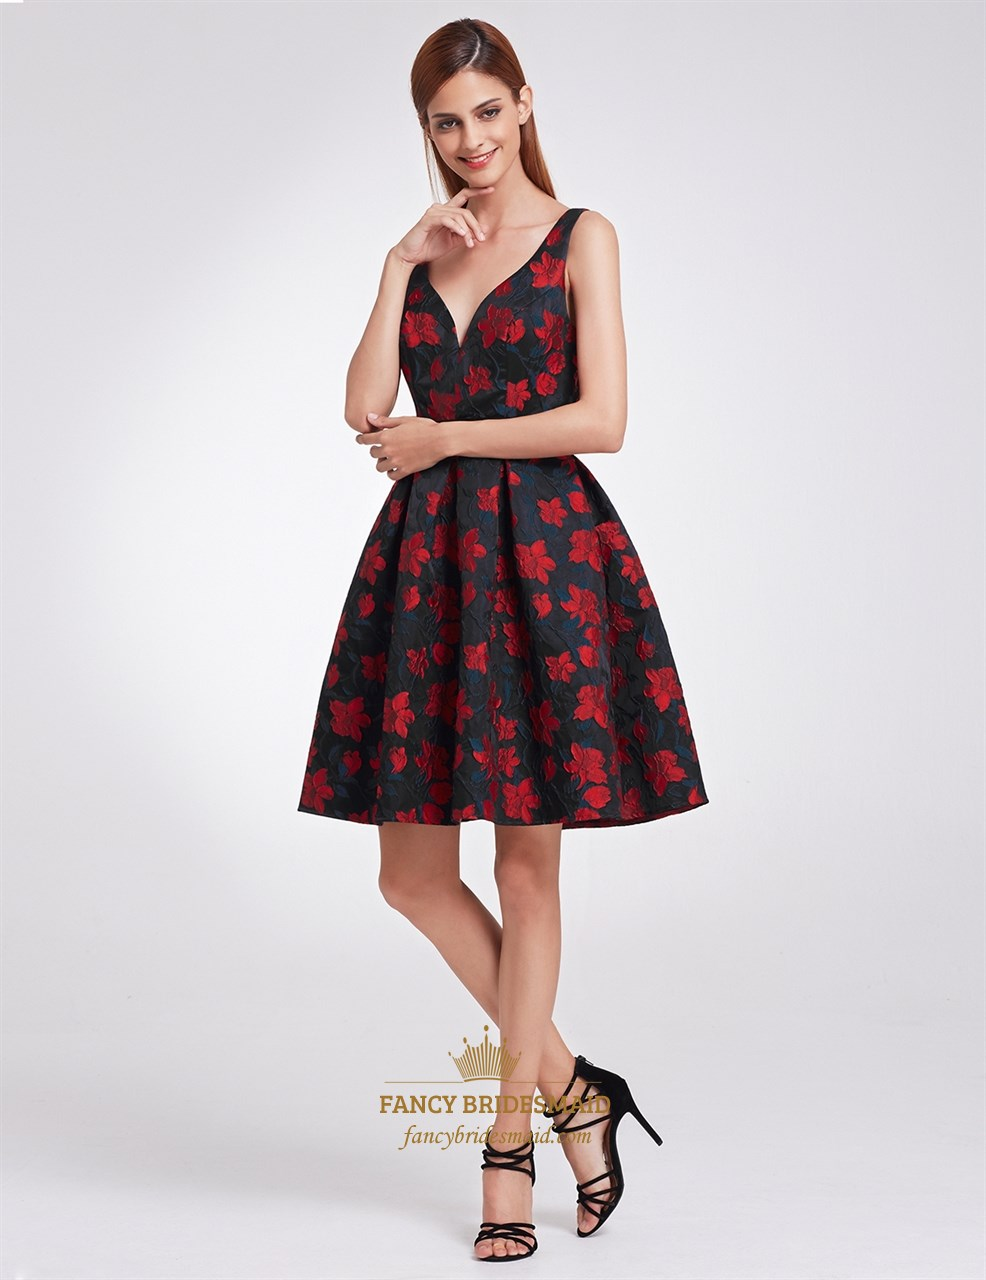 27f2a63a1573 Black And Red Sleeveless Floral Print V Neck A Line Knee Length Dress